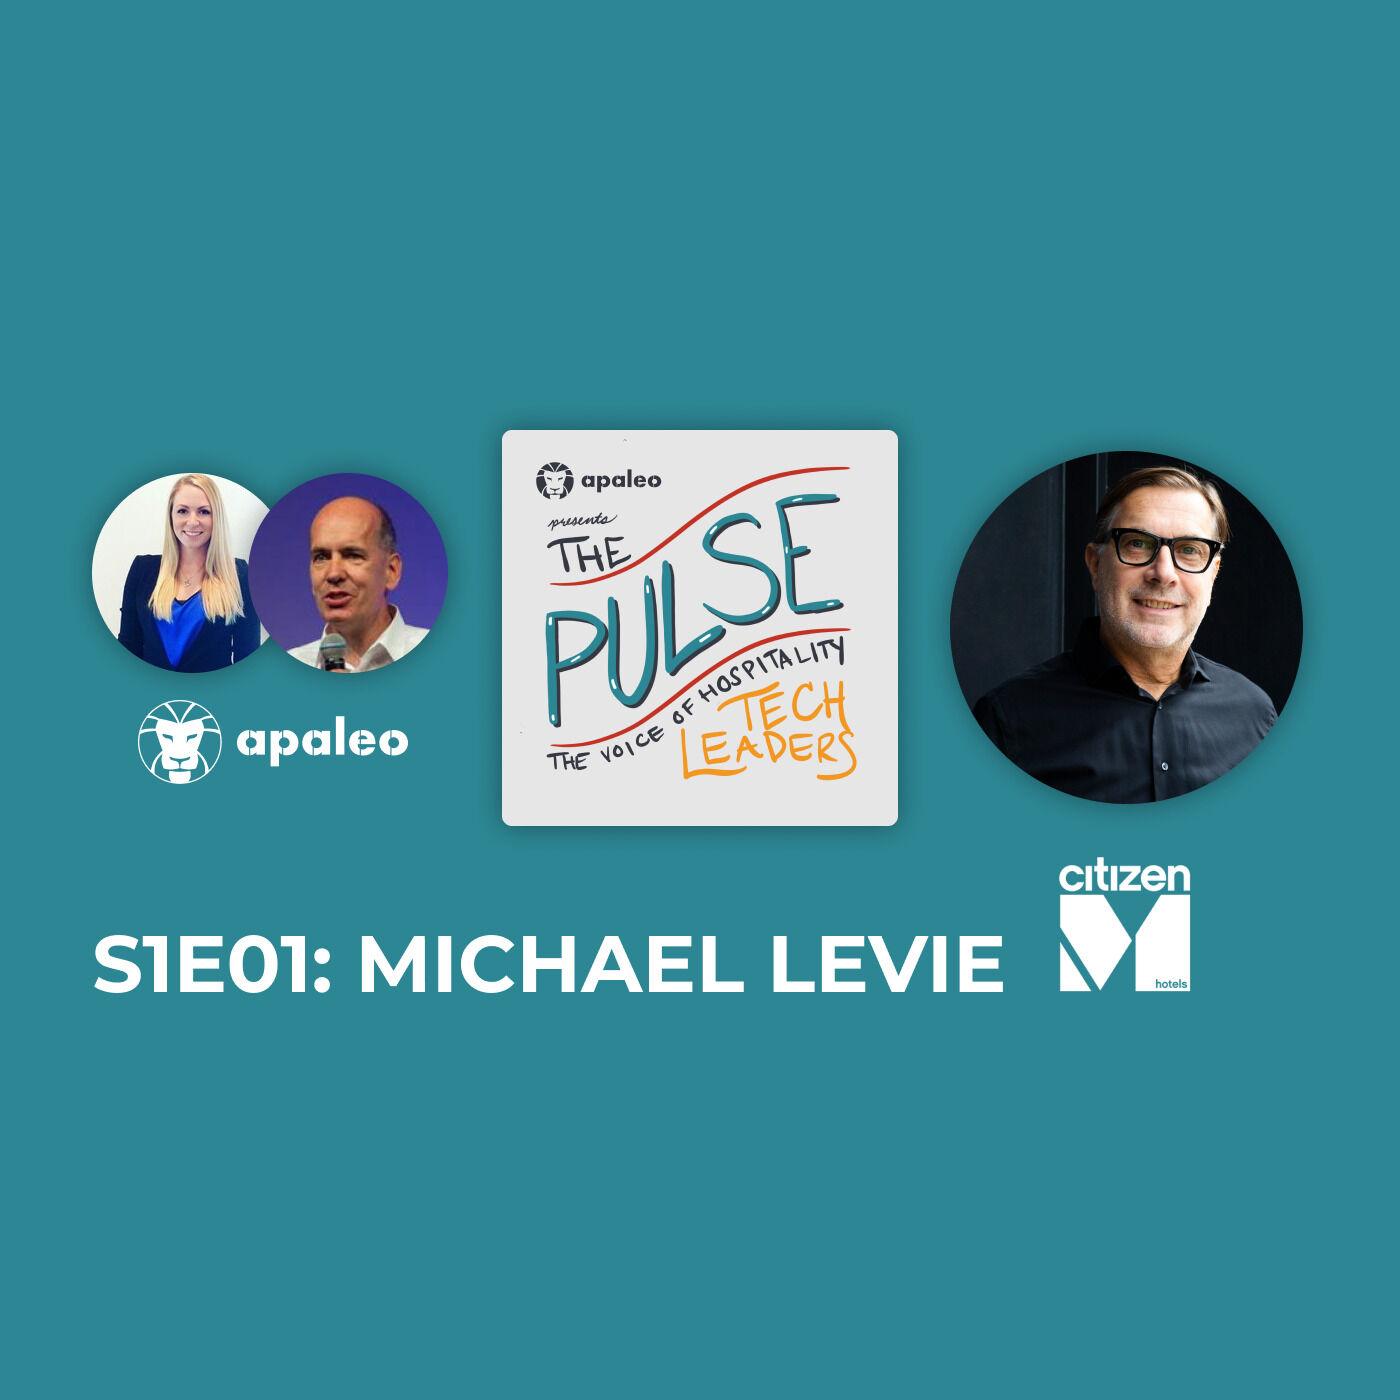 """Brand DNA, Company Values, & Tech Platforms"" citizenM's Michael Levie"